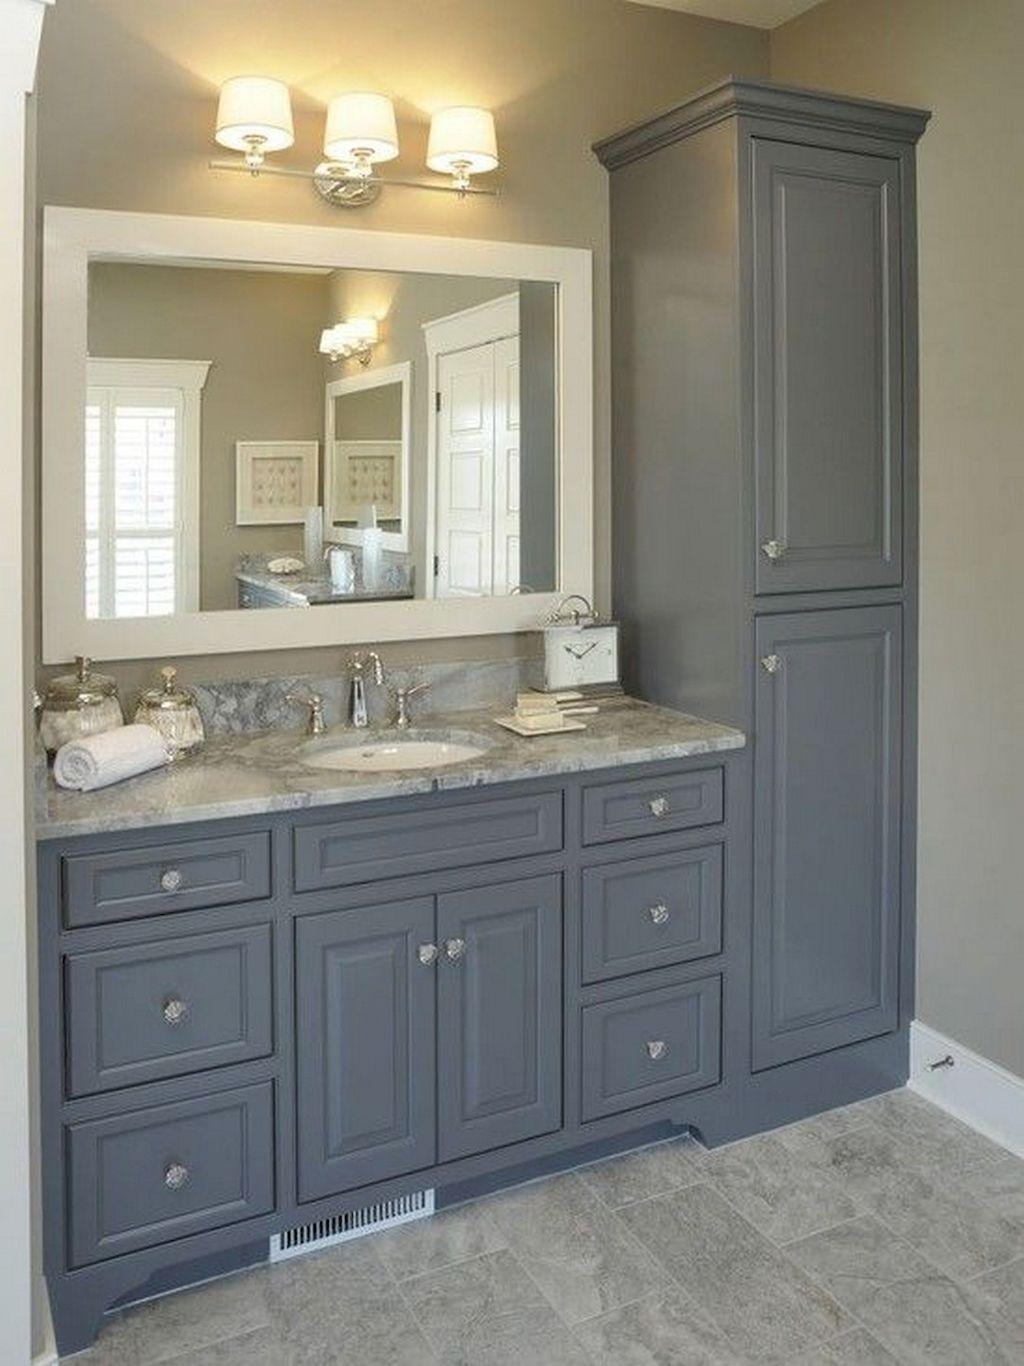 Bathroom Linen Cabinets Linen Linen Storage Ideas Linen within measurements 1024 X 1366